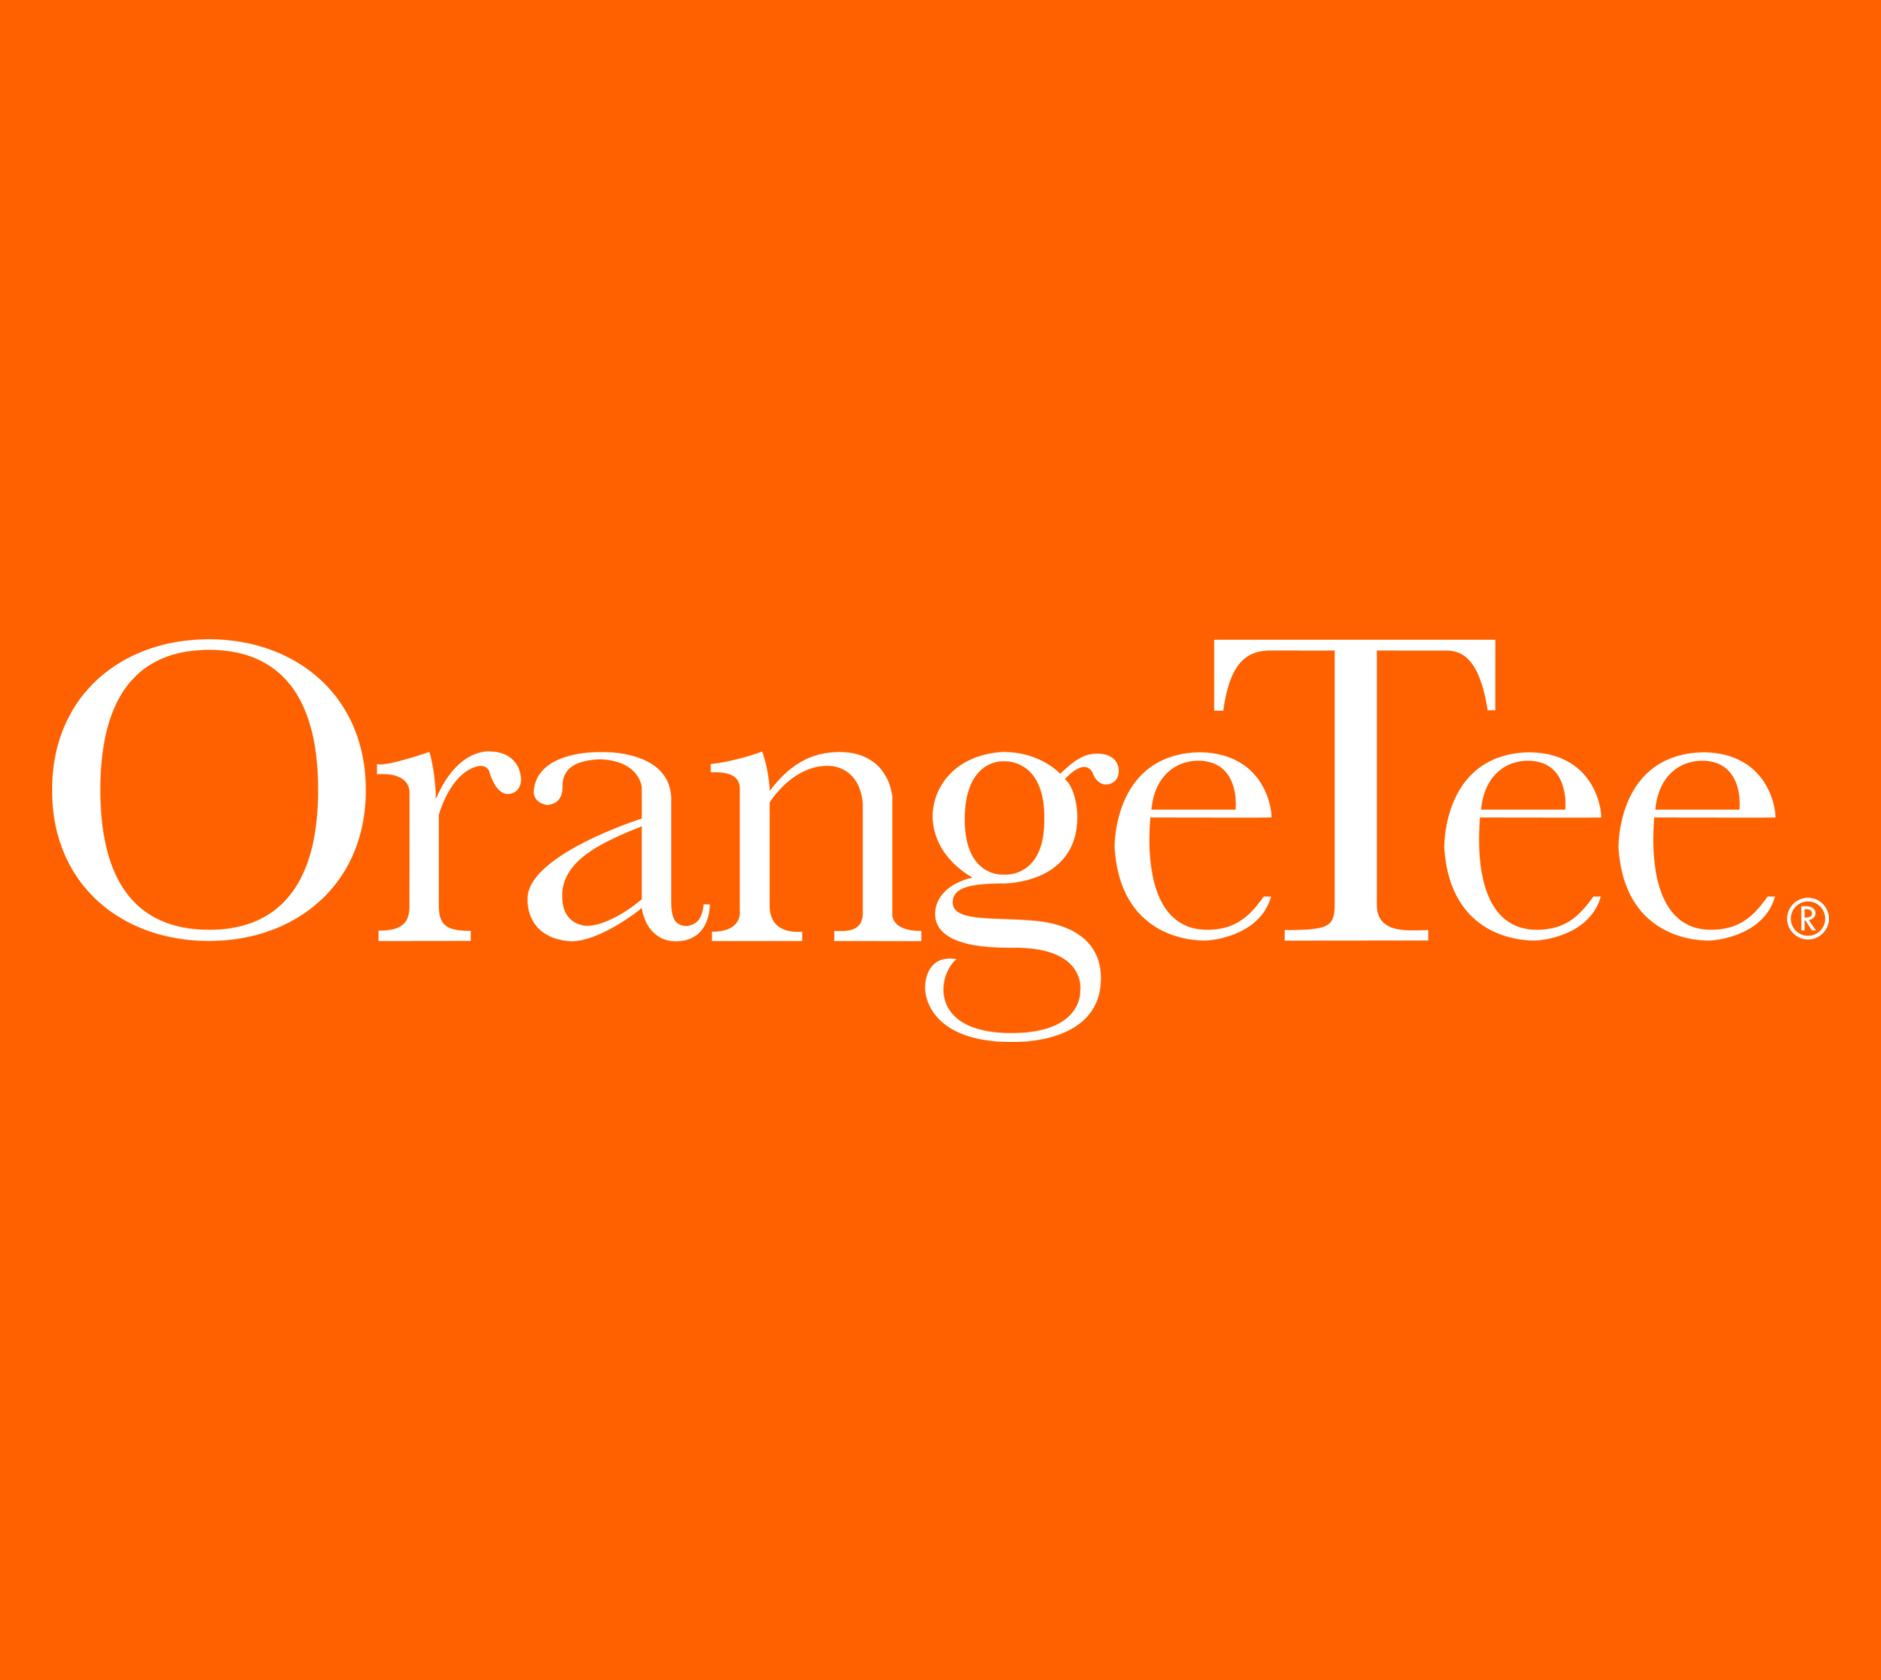 ORANGETEE & TIE PTE LTD